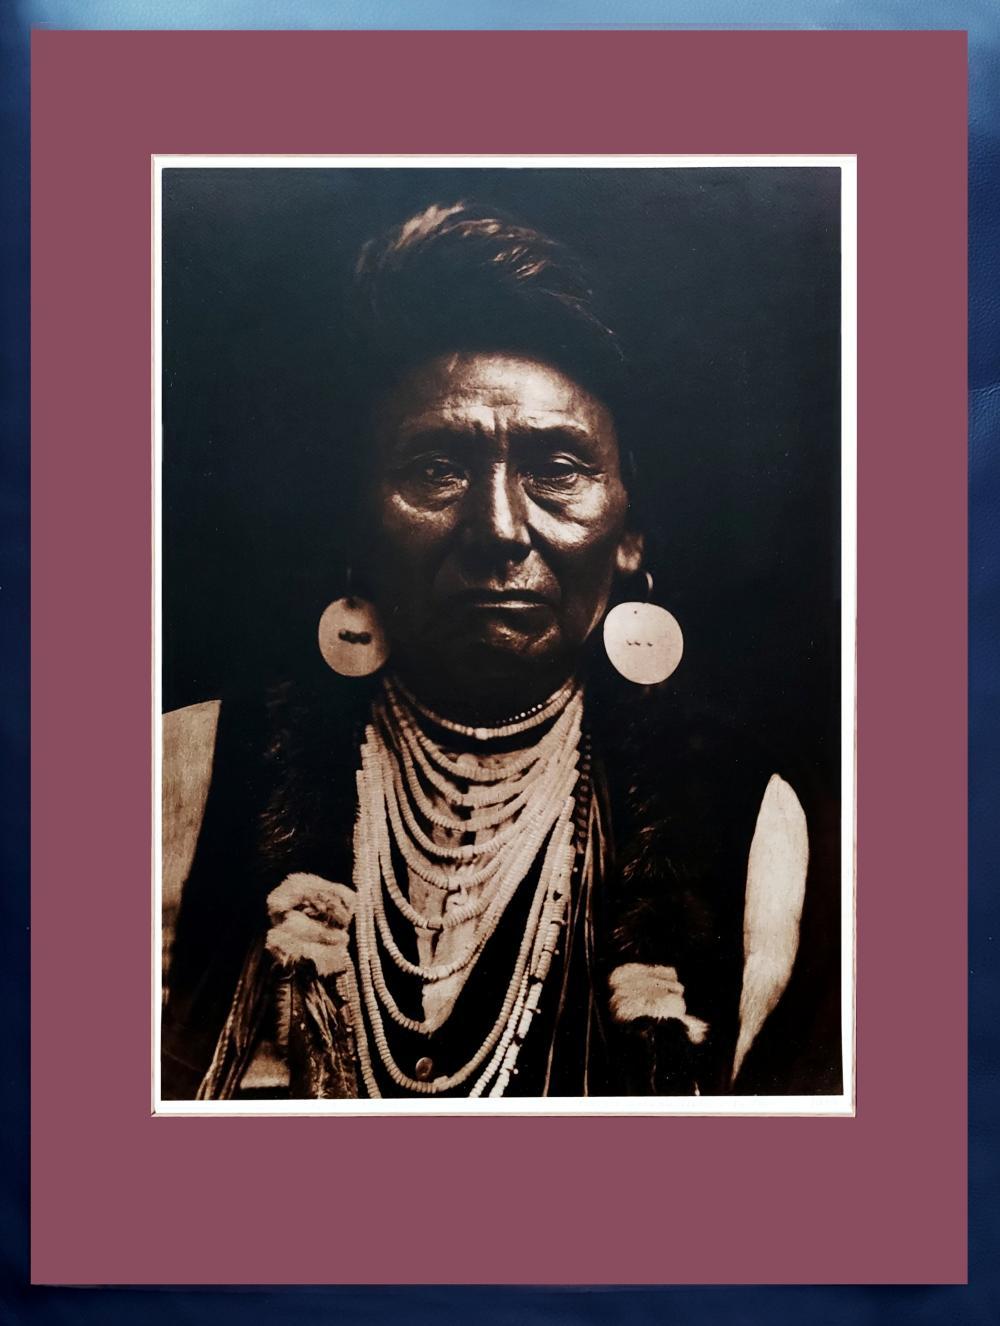 Edward S. Curtis: Chief Joseph Nez Perce, 1900 Printed by Jean-Anthony du Lac, 1974